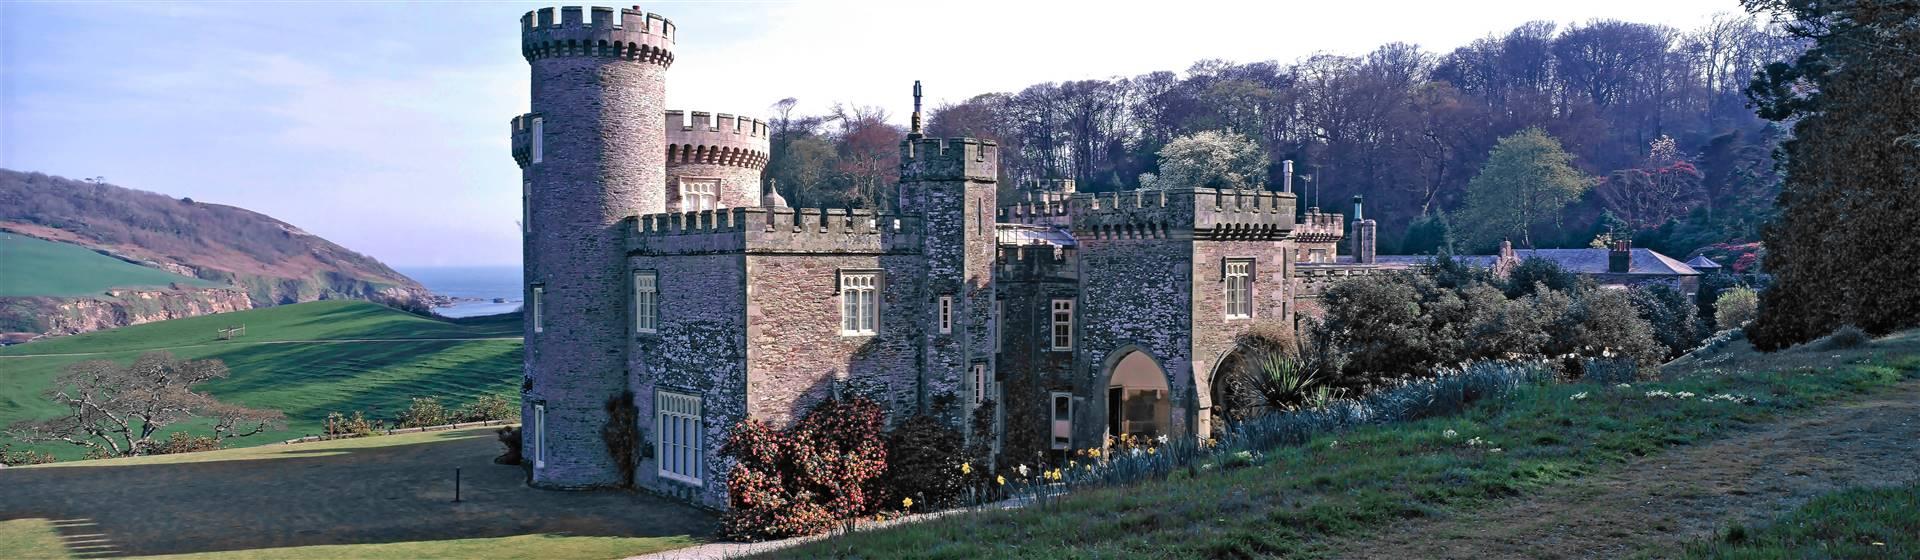 "<img src=""caerhays_castle©shutterstock.jpeg"" alt=""Caerhays Castle""/>"